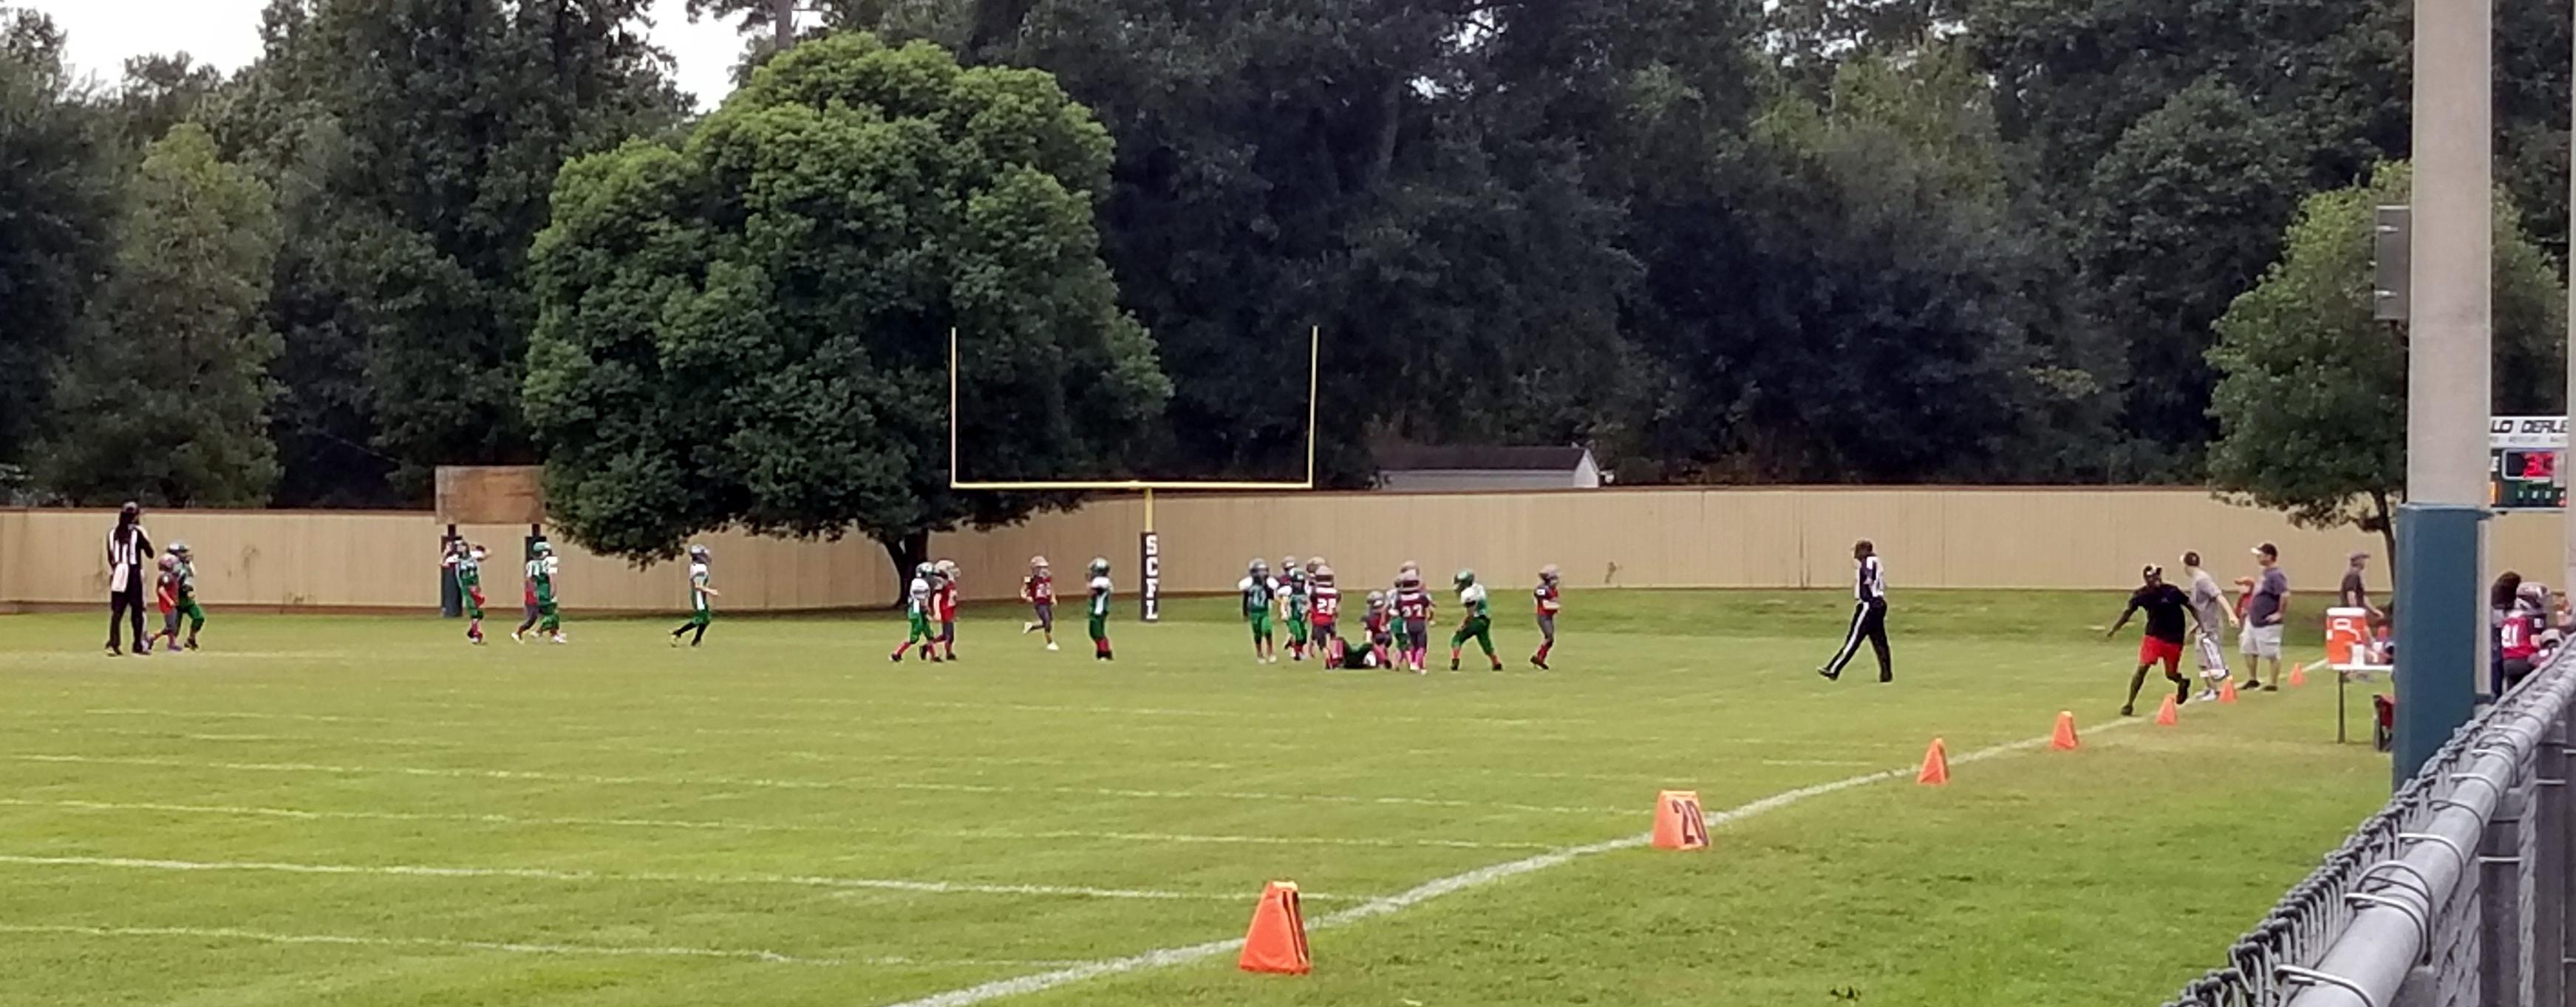 South County Football League (SCFL) At Gullo Park image 3